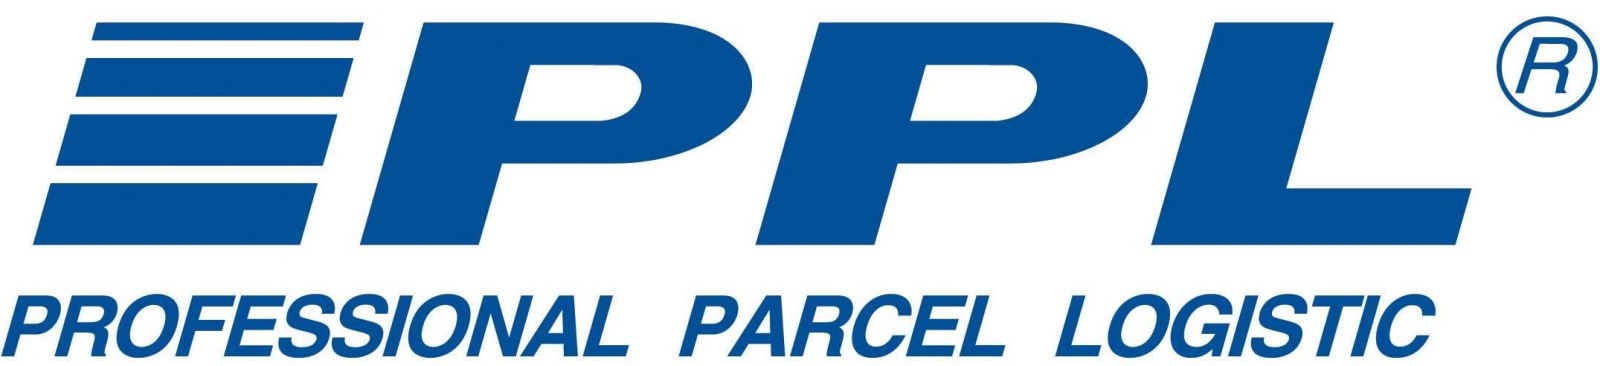 635750174113511375_PPL logo